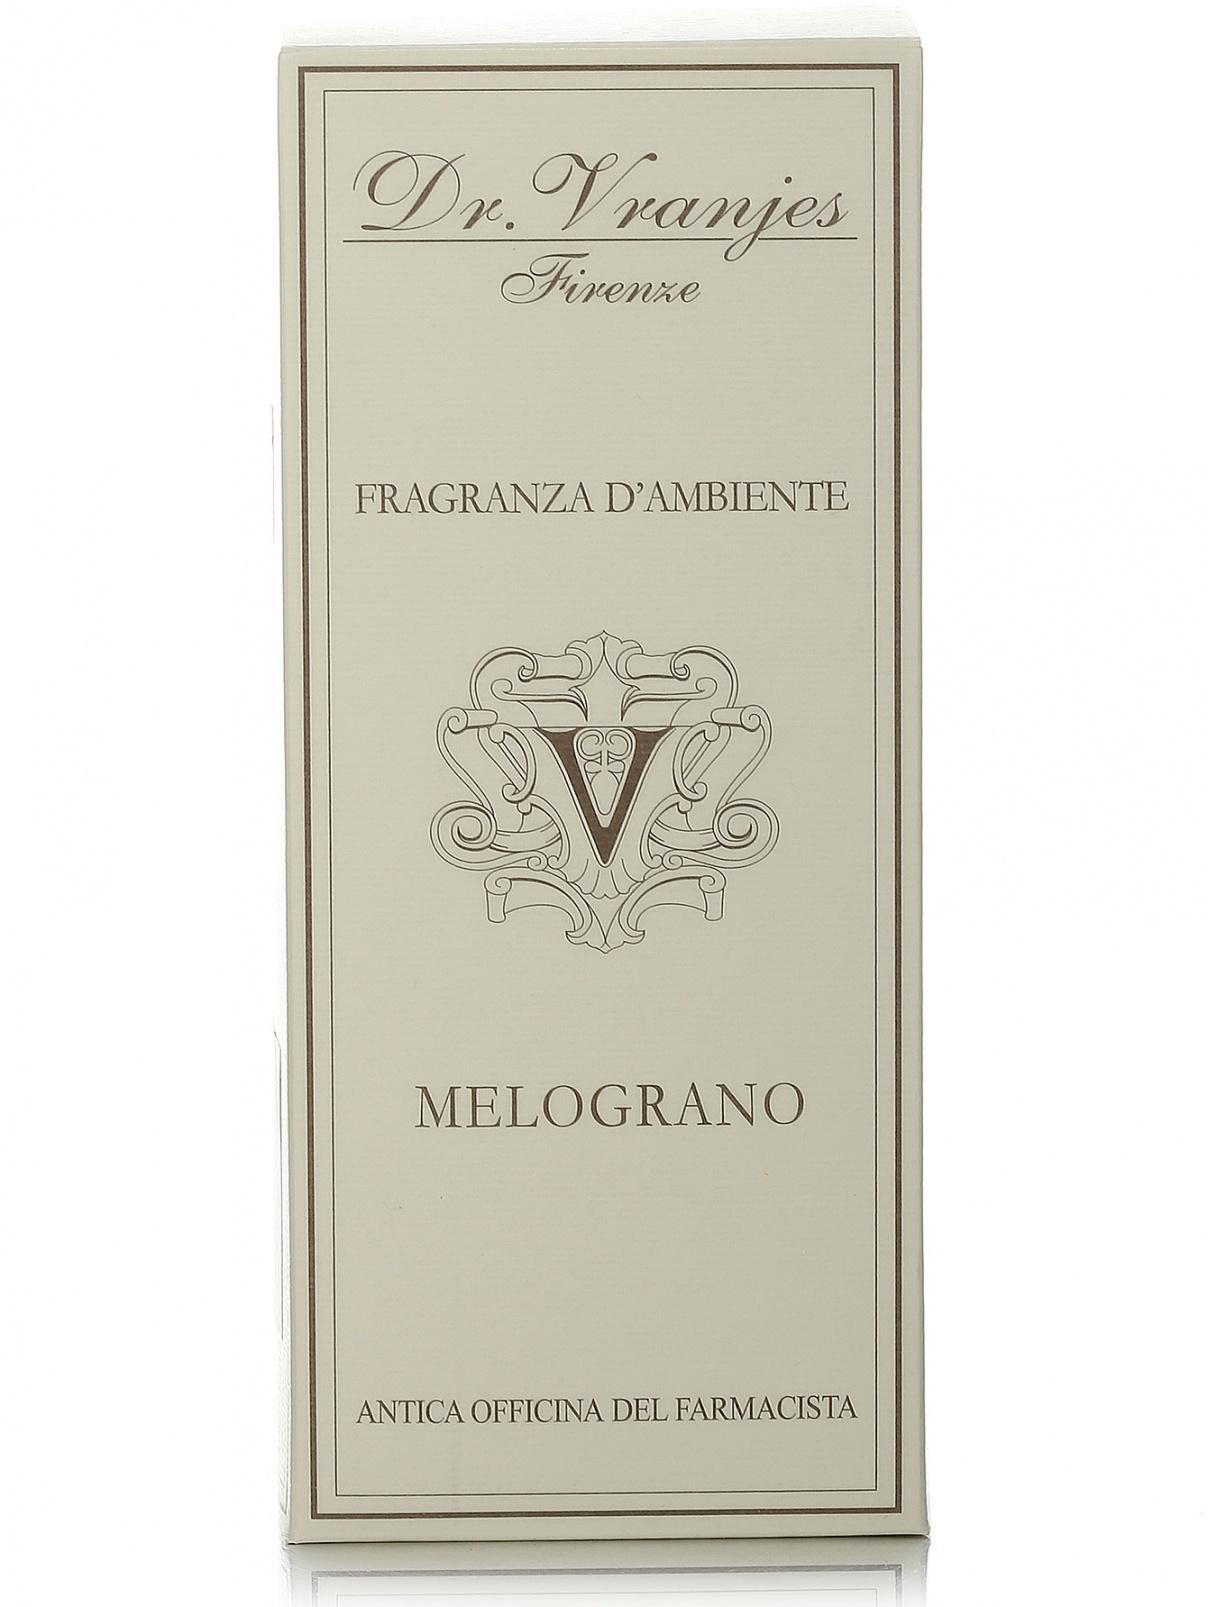 Ароматизатор воздуха Melograno - Home Fragrance, 250ml Dr. Vranjes  –  Модель Общий вид